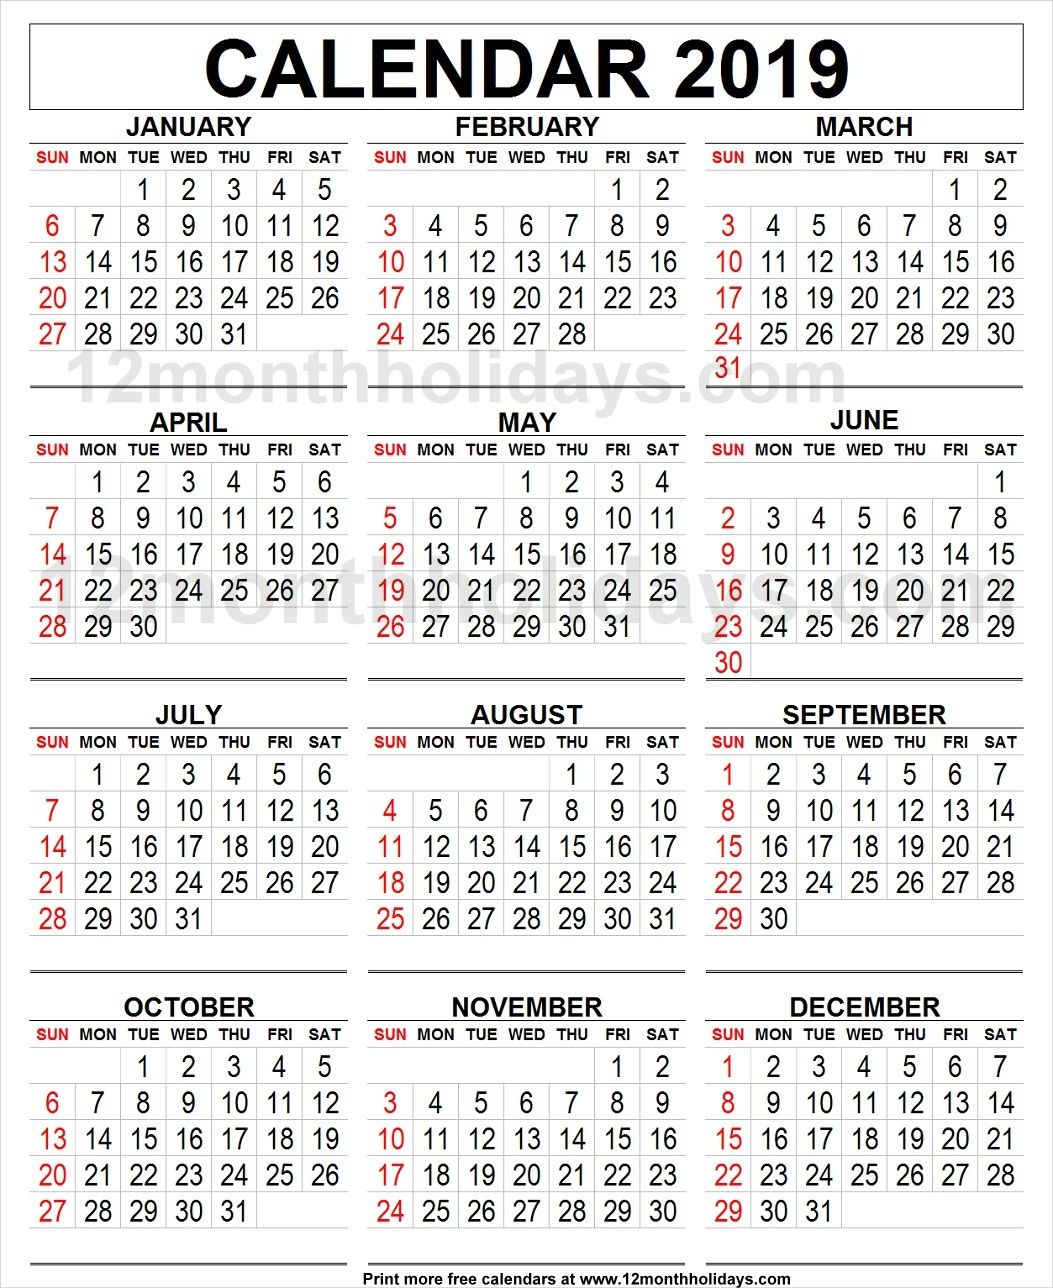 Large Calendar 2019 Calendar 2019 Large | 2019 Yearly Calendar | Printable blank